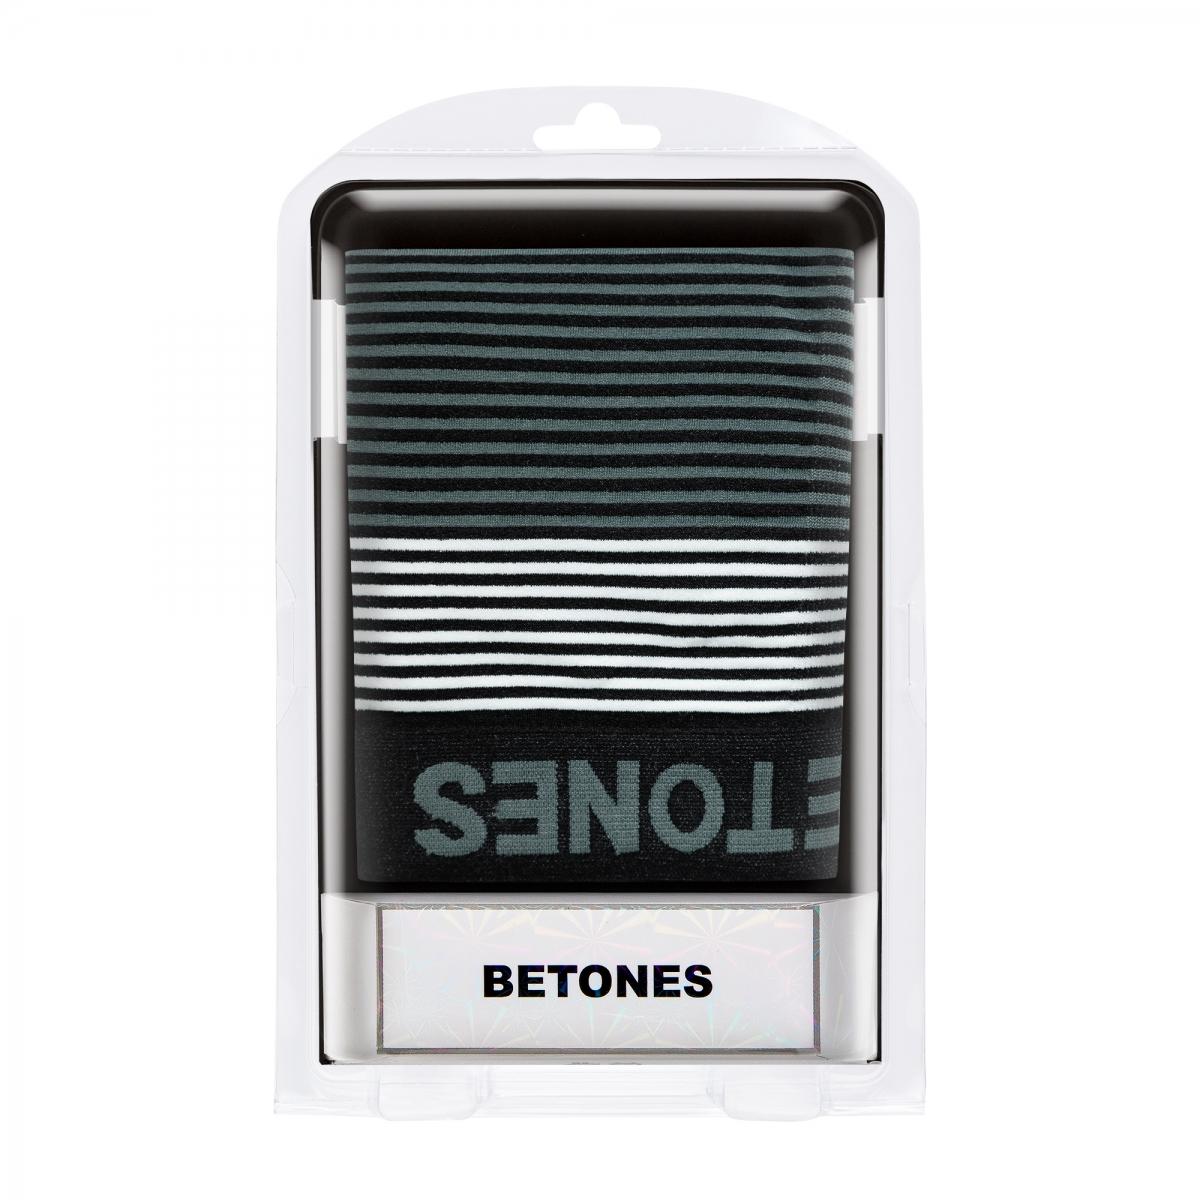 BETONES ビトーンズ ボクサーパンツ NEON4-B006 BLACKxGRAY